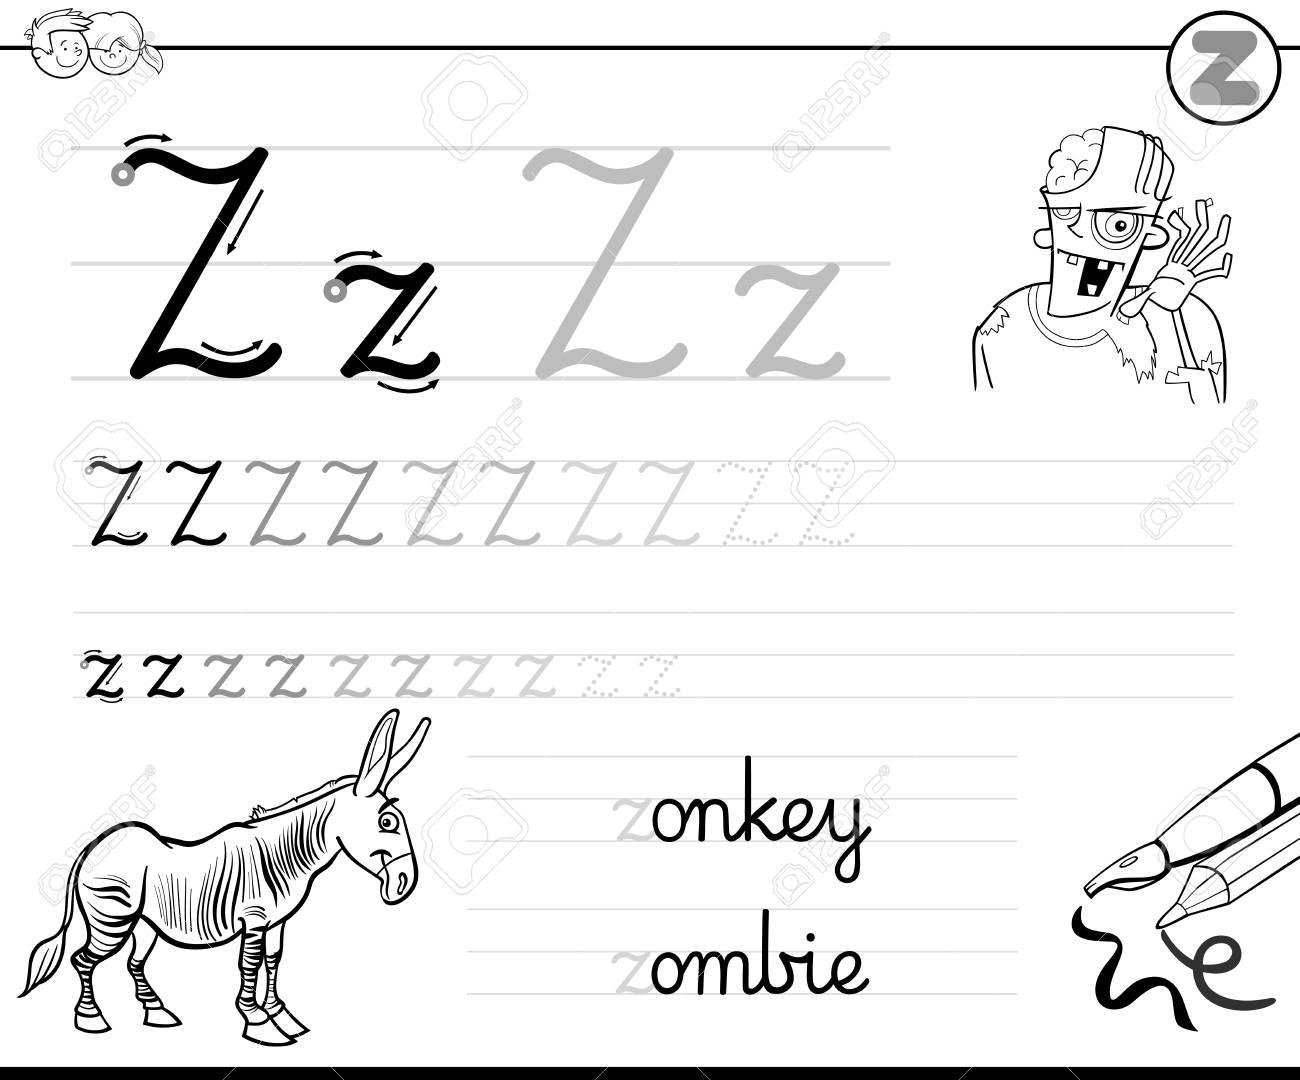 Preschool Worksheets Letter Z 3